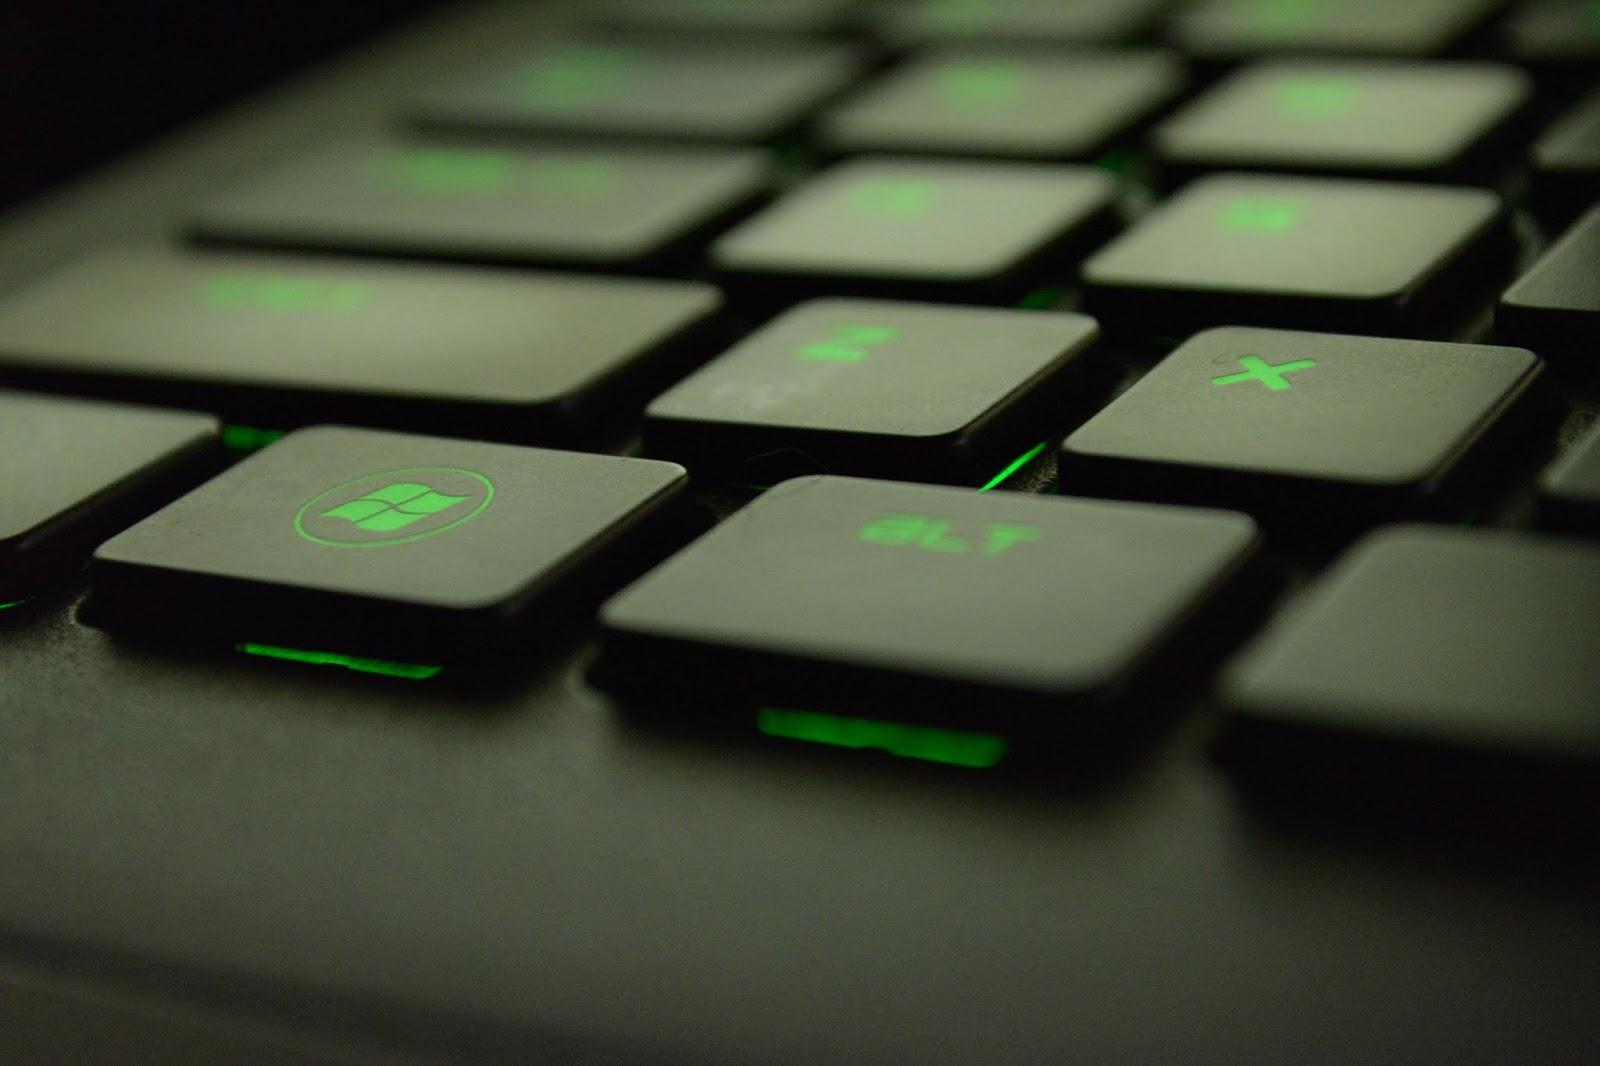 Whats the winkey key | Windows key+Break: Show System Properties